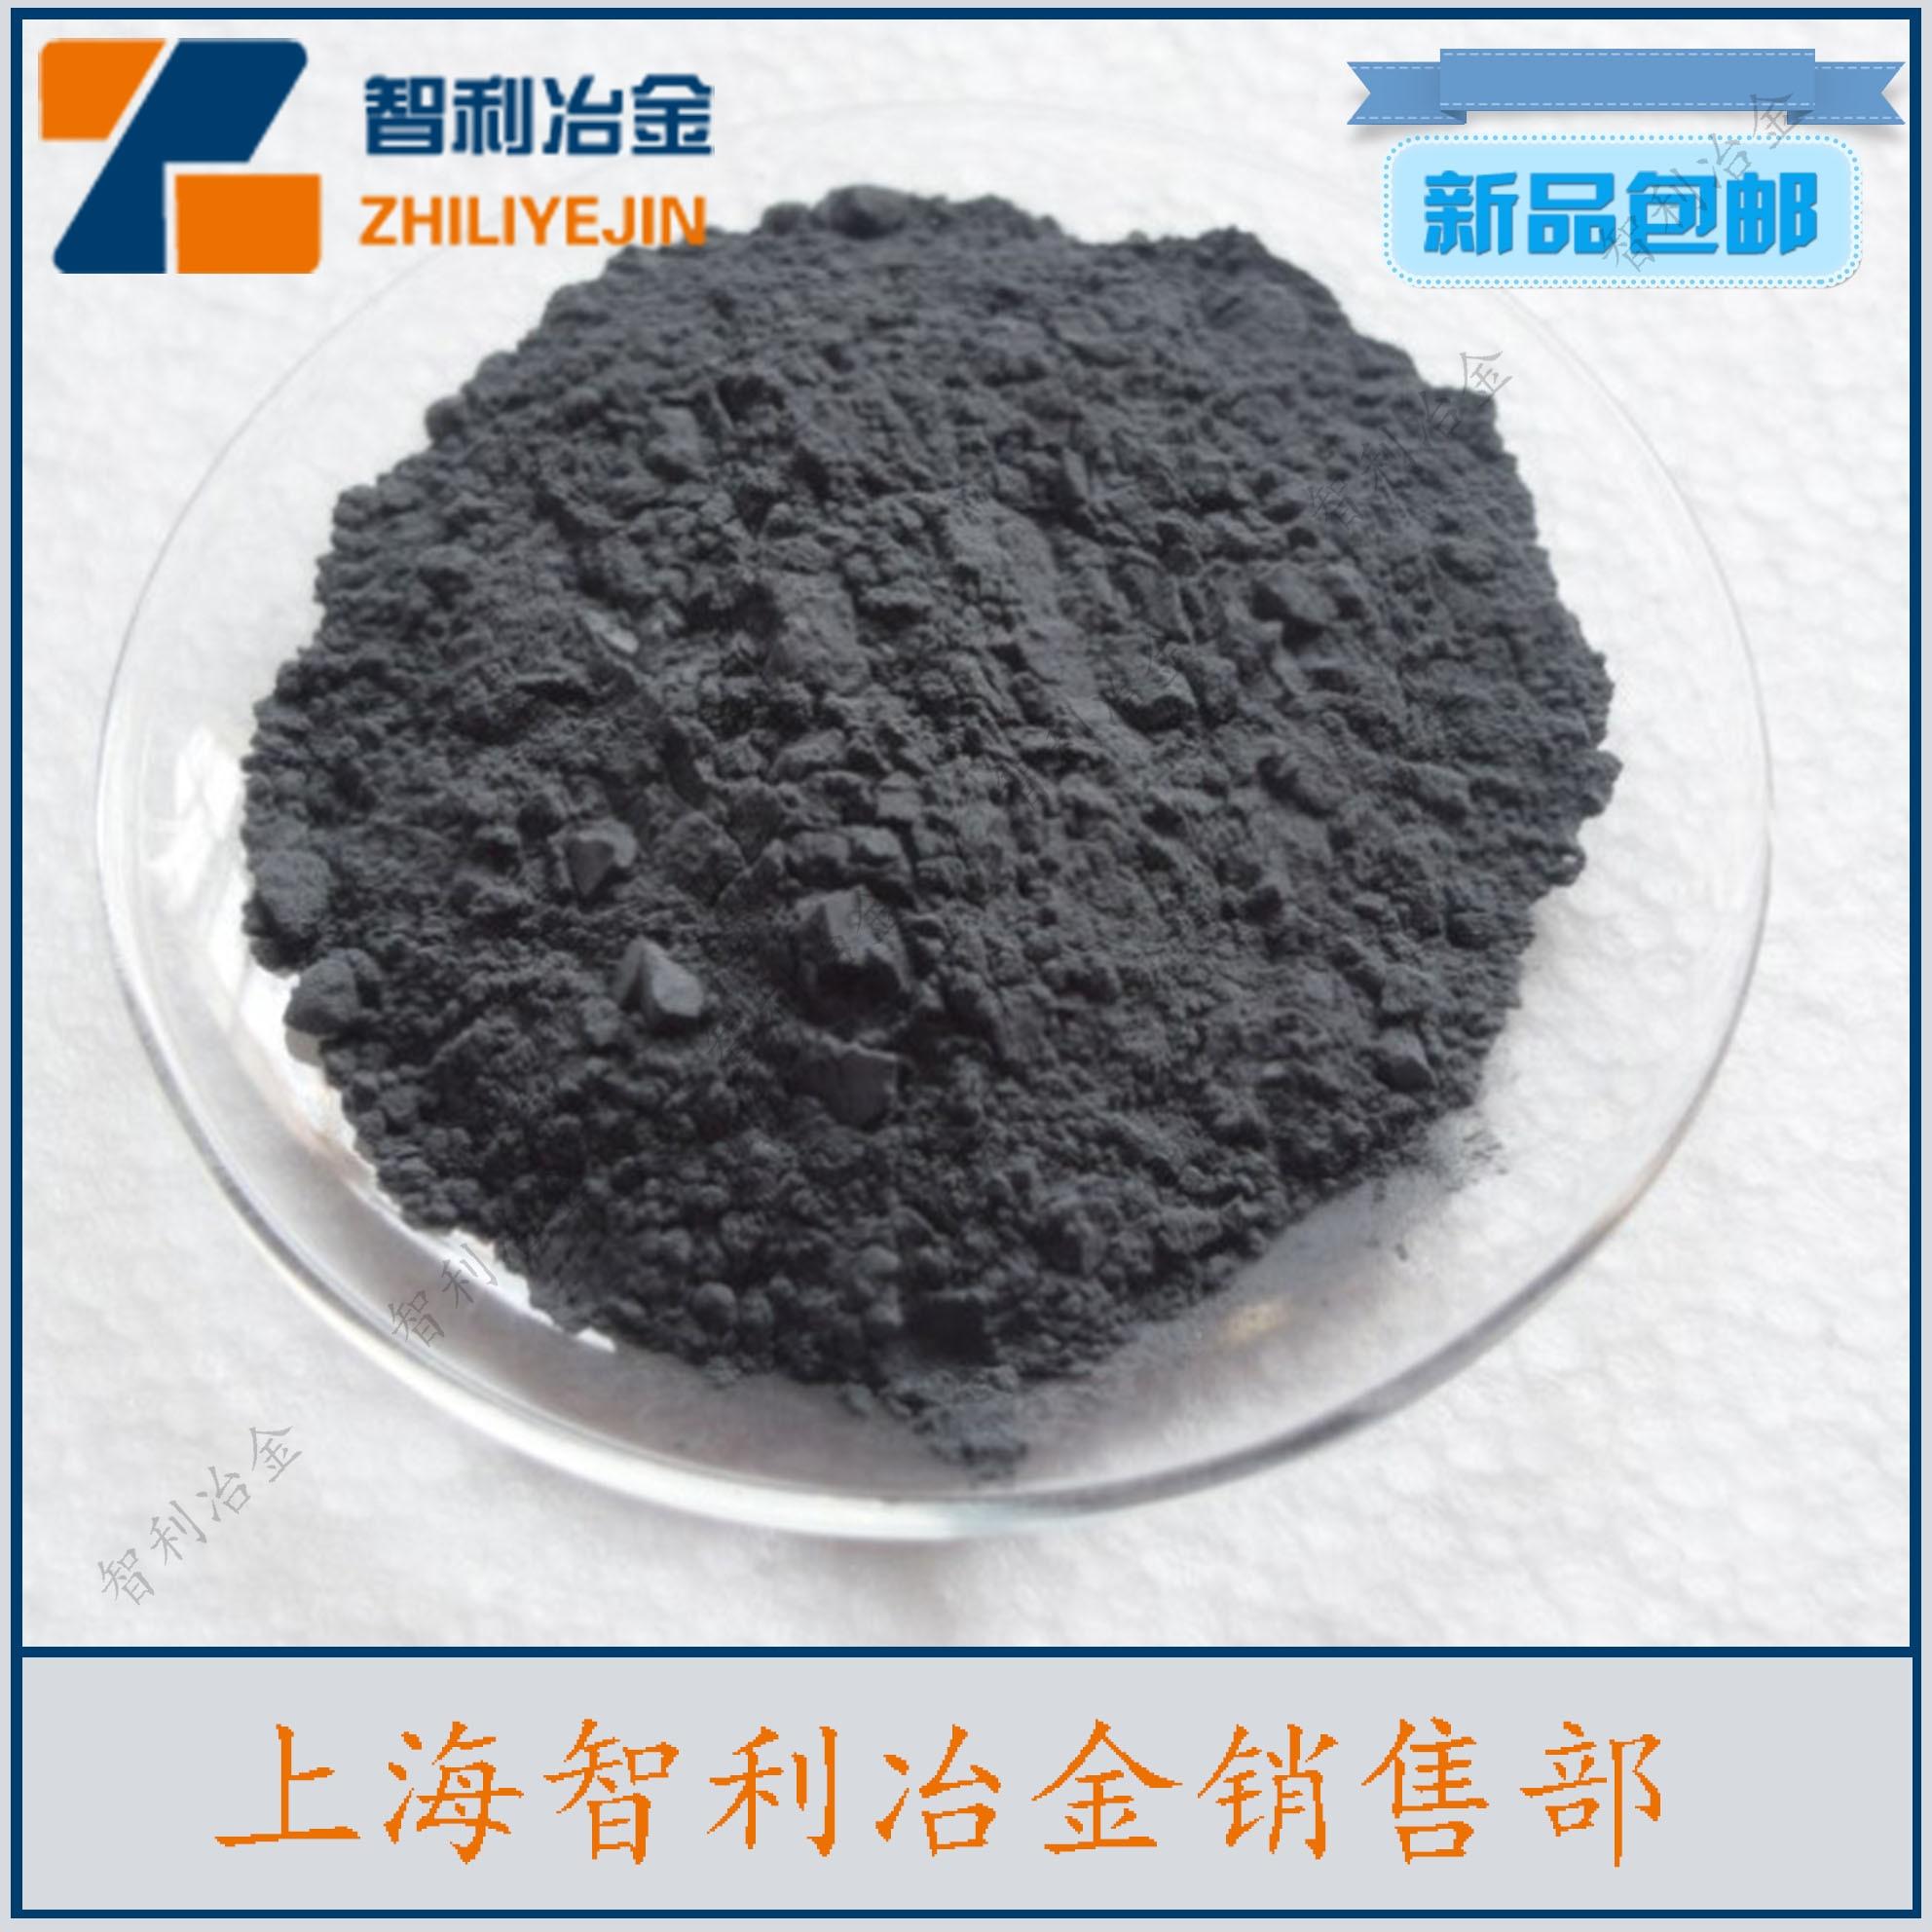 High purity iron powder, metallic iron powder, superfine iron powder, nano iron powder, alloy powder high purity iron powder metallic iron powder superfine iron powder nano iron powder alloy powder